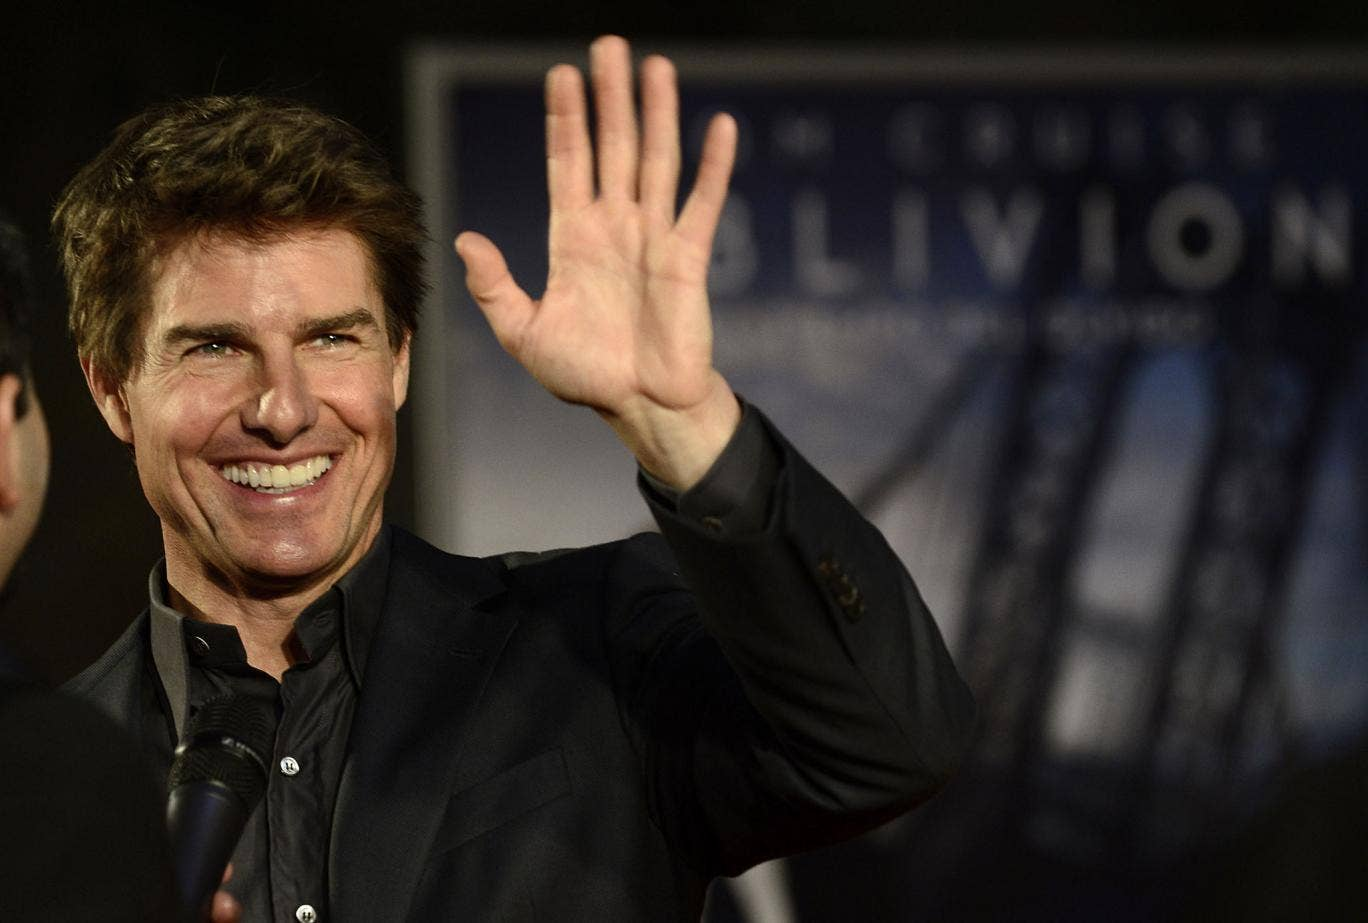 Tom Cruise promotes his new film Oblivion